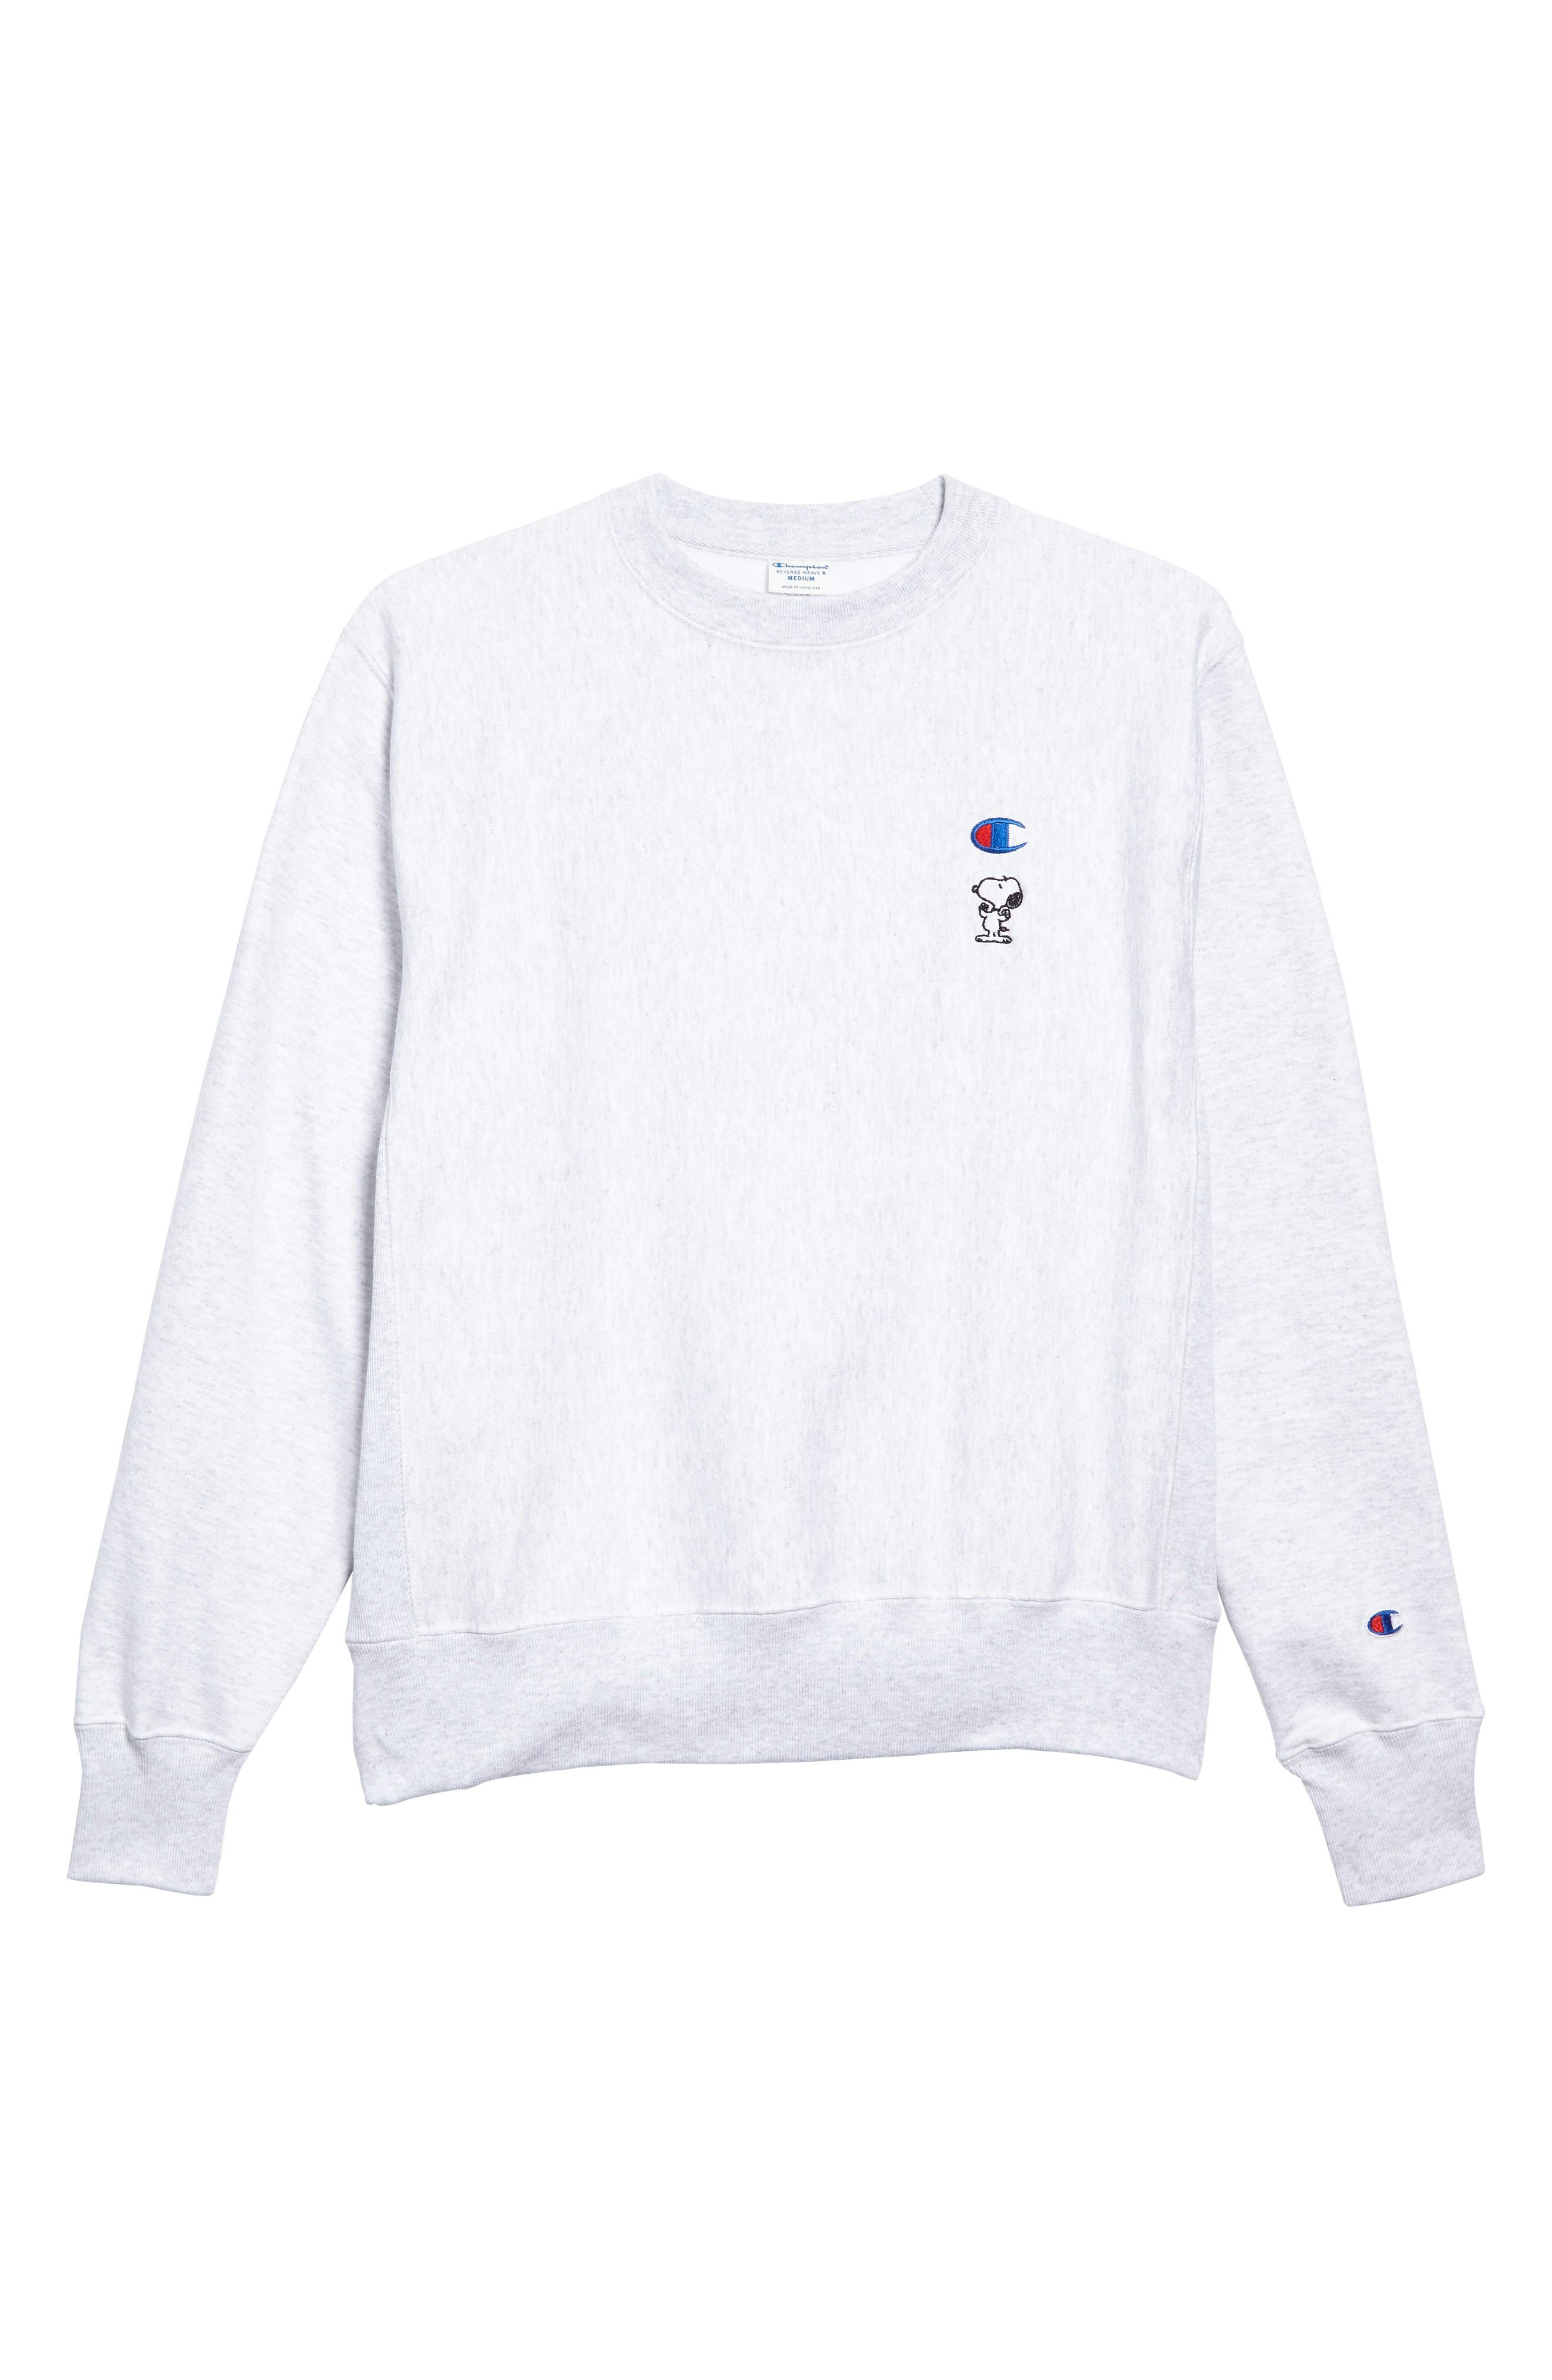 Champion Snoopy Unisex Sweatshirt In Silver Grey